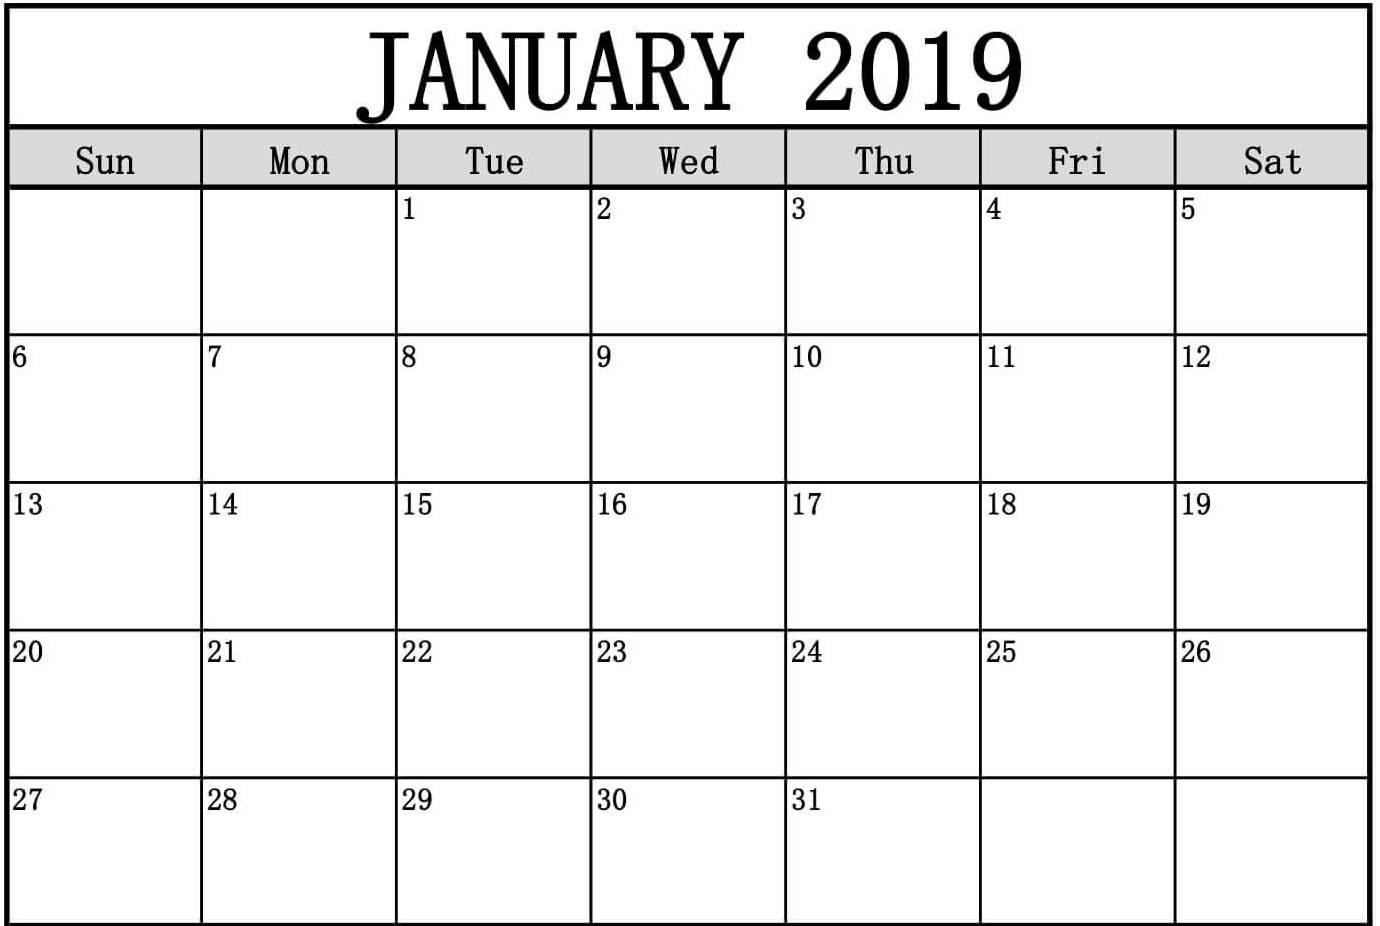 Calendar For January 2019